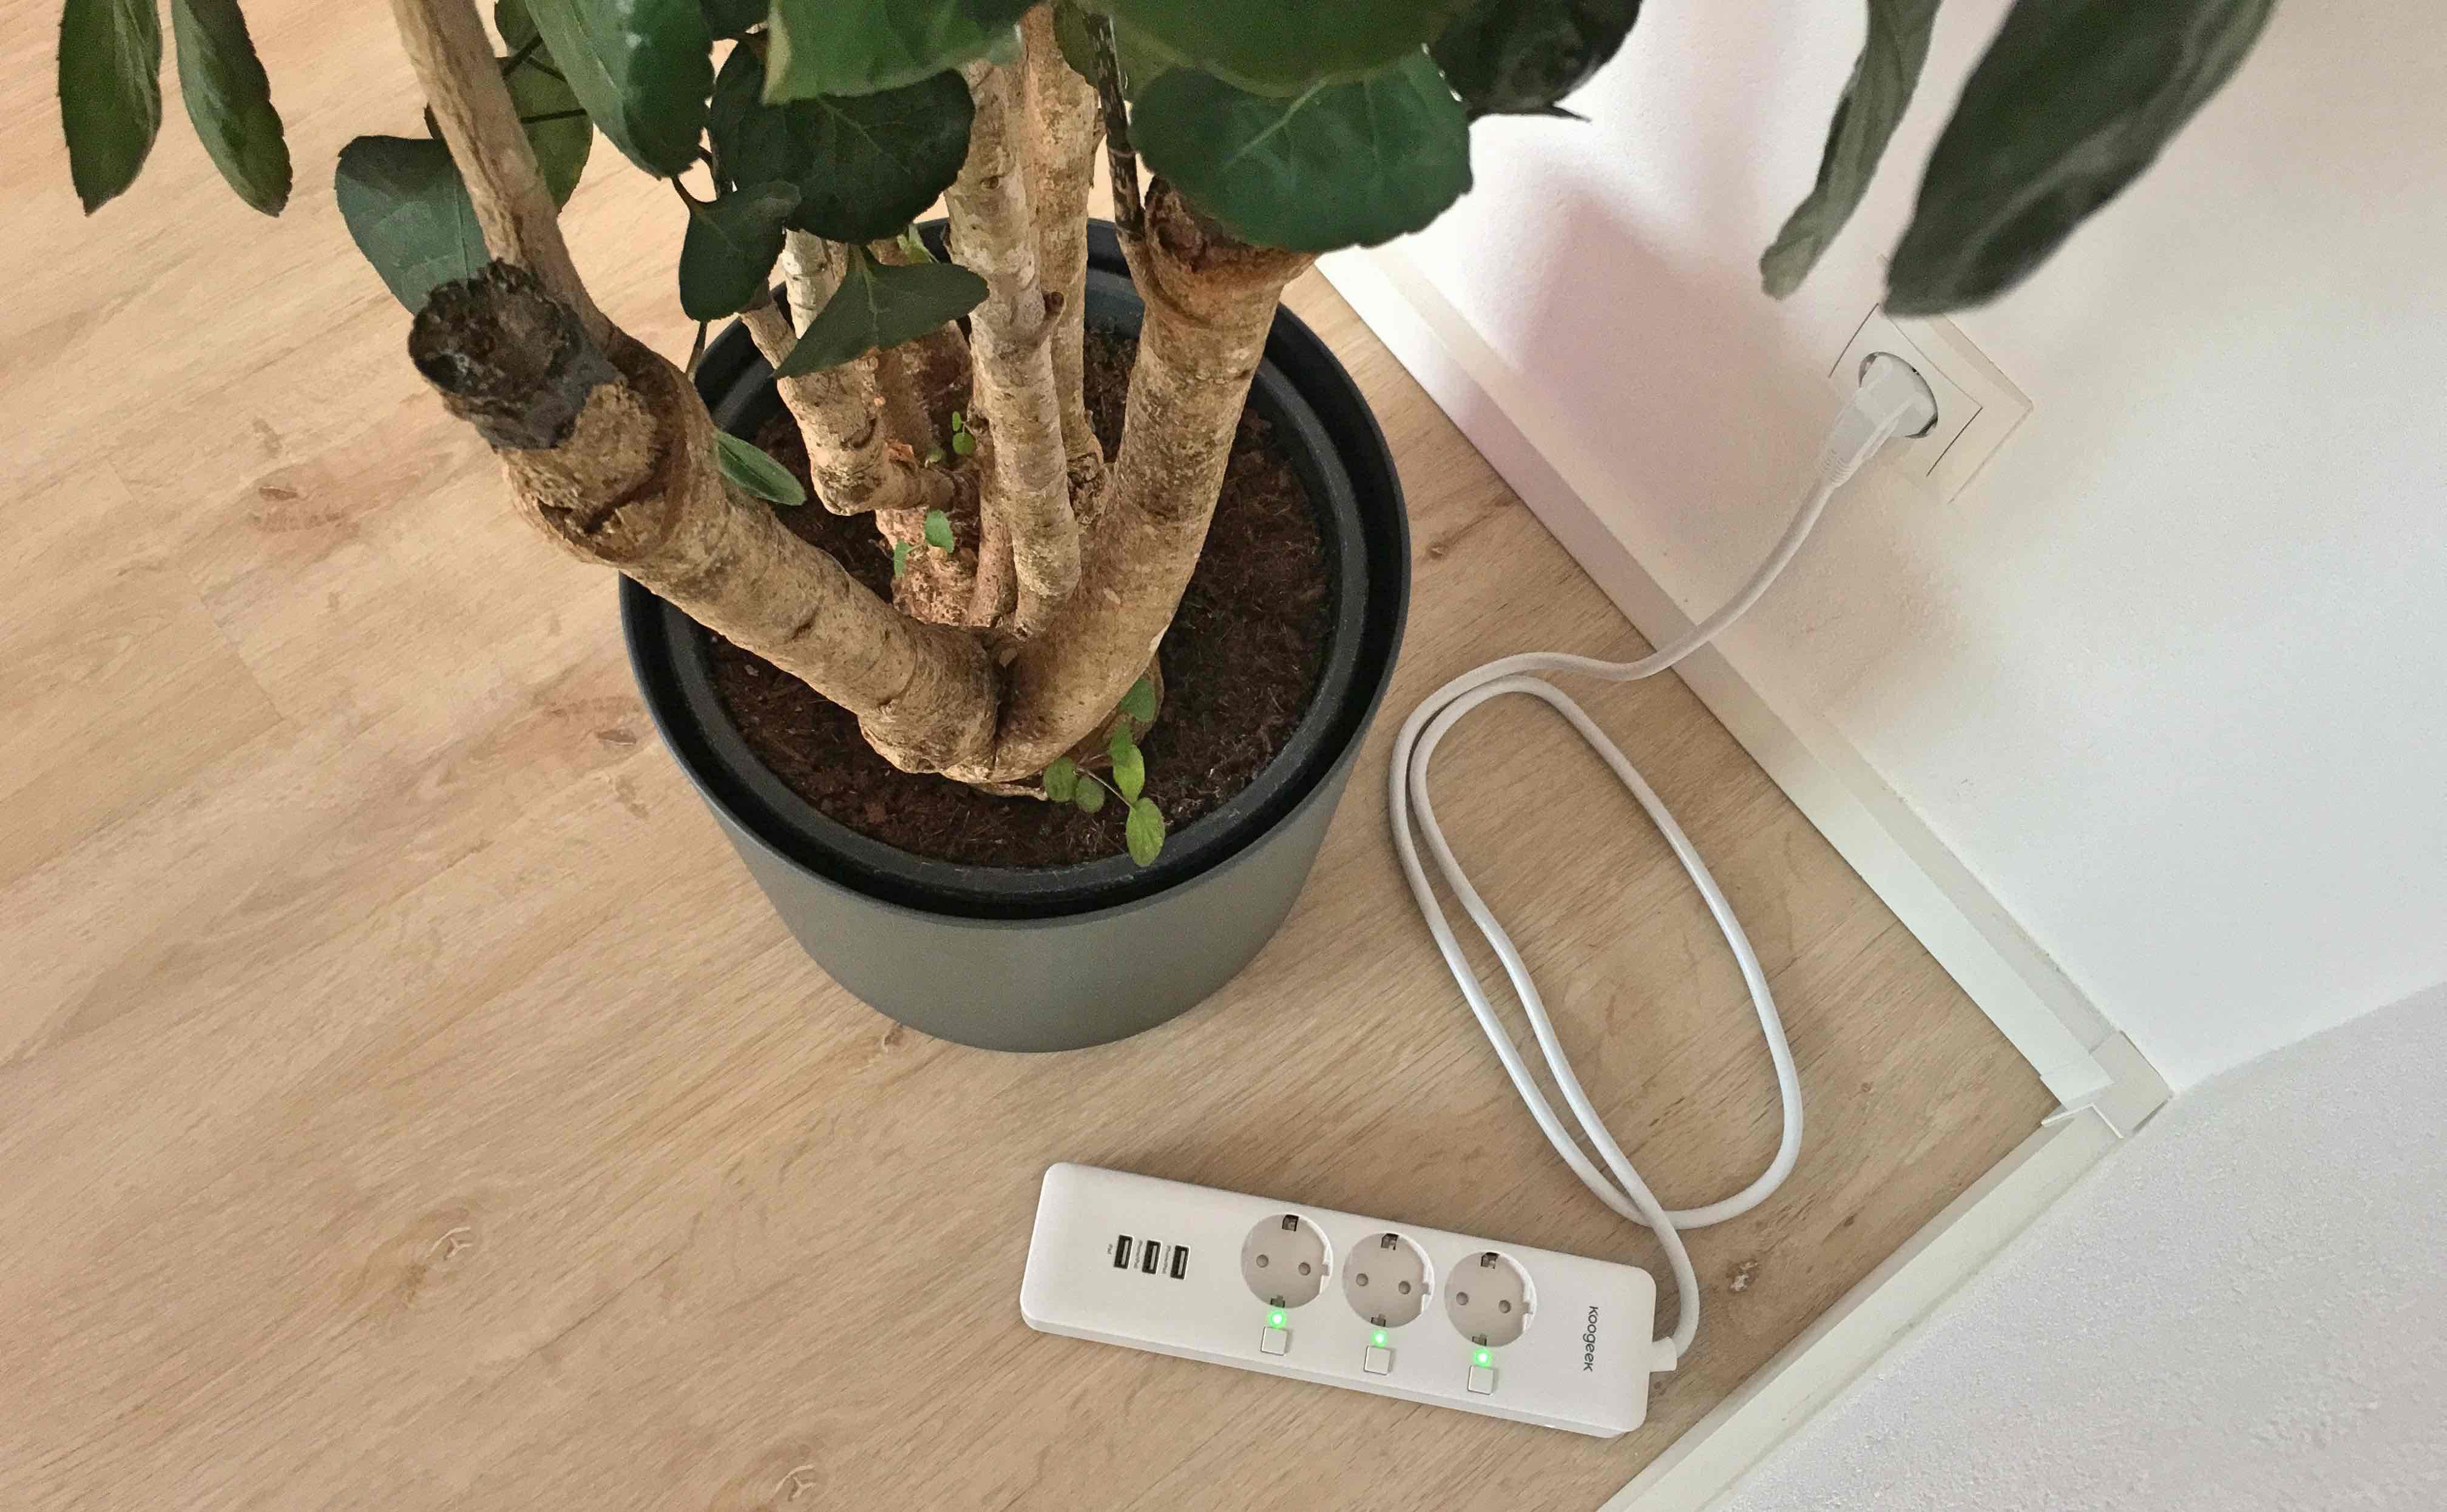 Koogeek_Steckdosenleiste_HomeKit_Review_Artikel3 Koogeek Steckdosenleiste mit HomeKit - drei Geräte über nur ein Gerät steuern